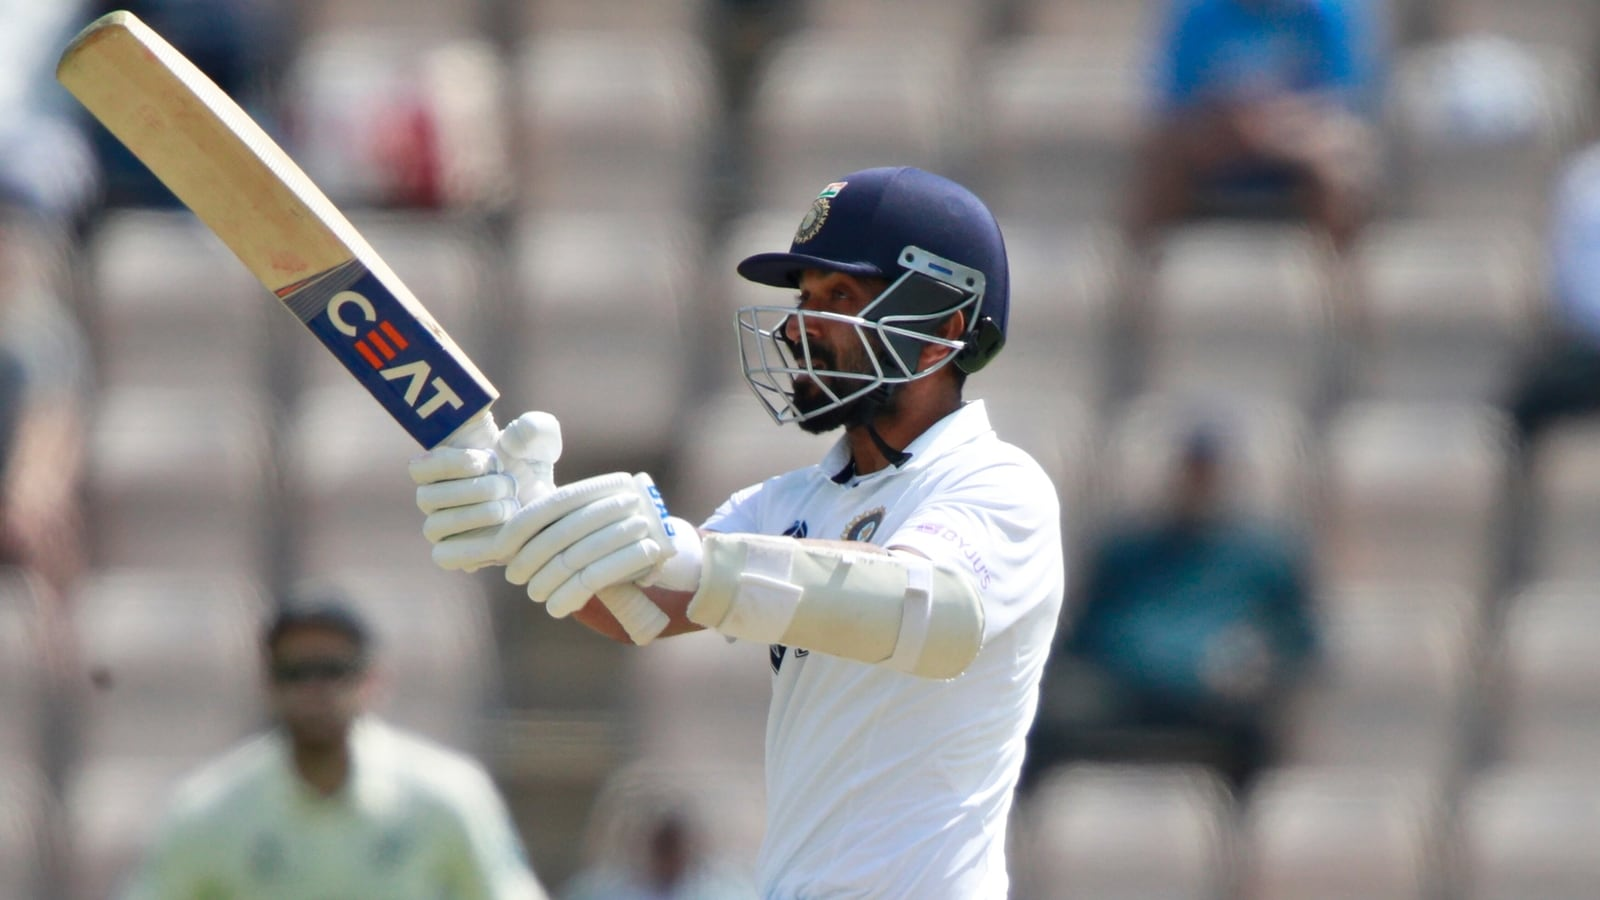 India vs England: Ajinkya Rahane gives major update on his fitness ahead of  first Test | Cricket - Hindustan Times